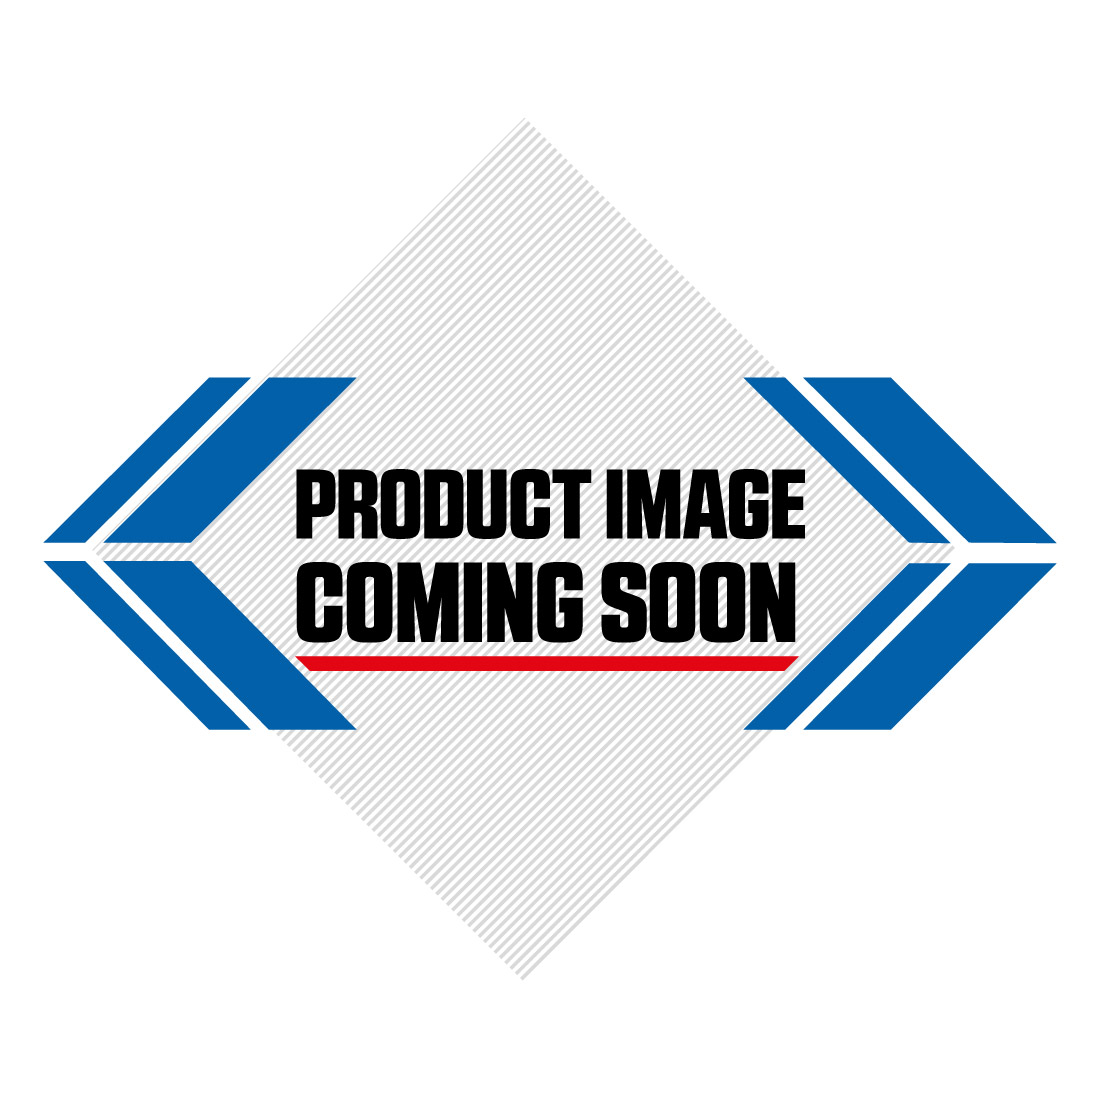 Renthal Twinring Rear Sprocket Kawasaki KX KXF KDX KLX Suzuki RMZ - Green Image-2>